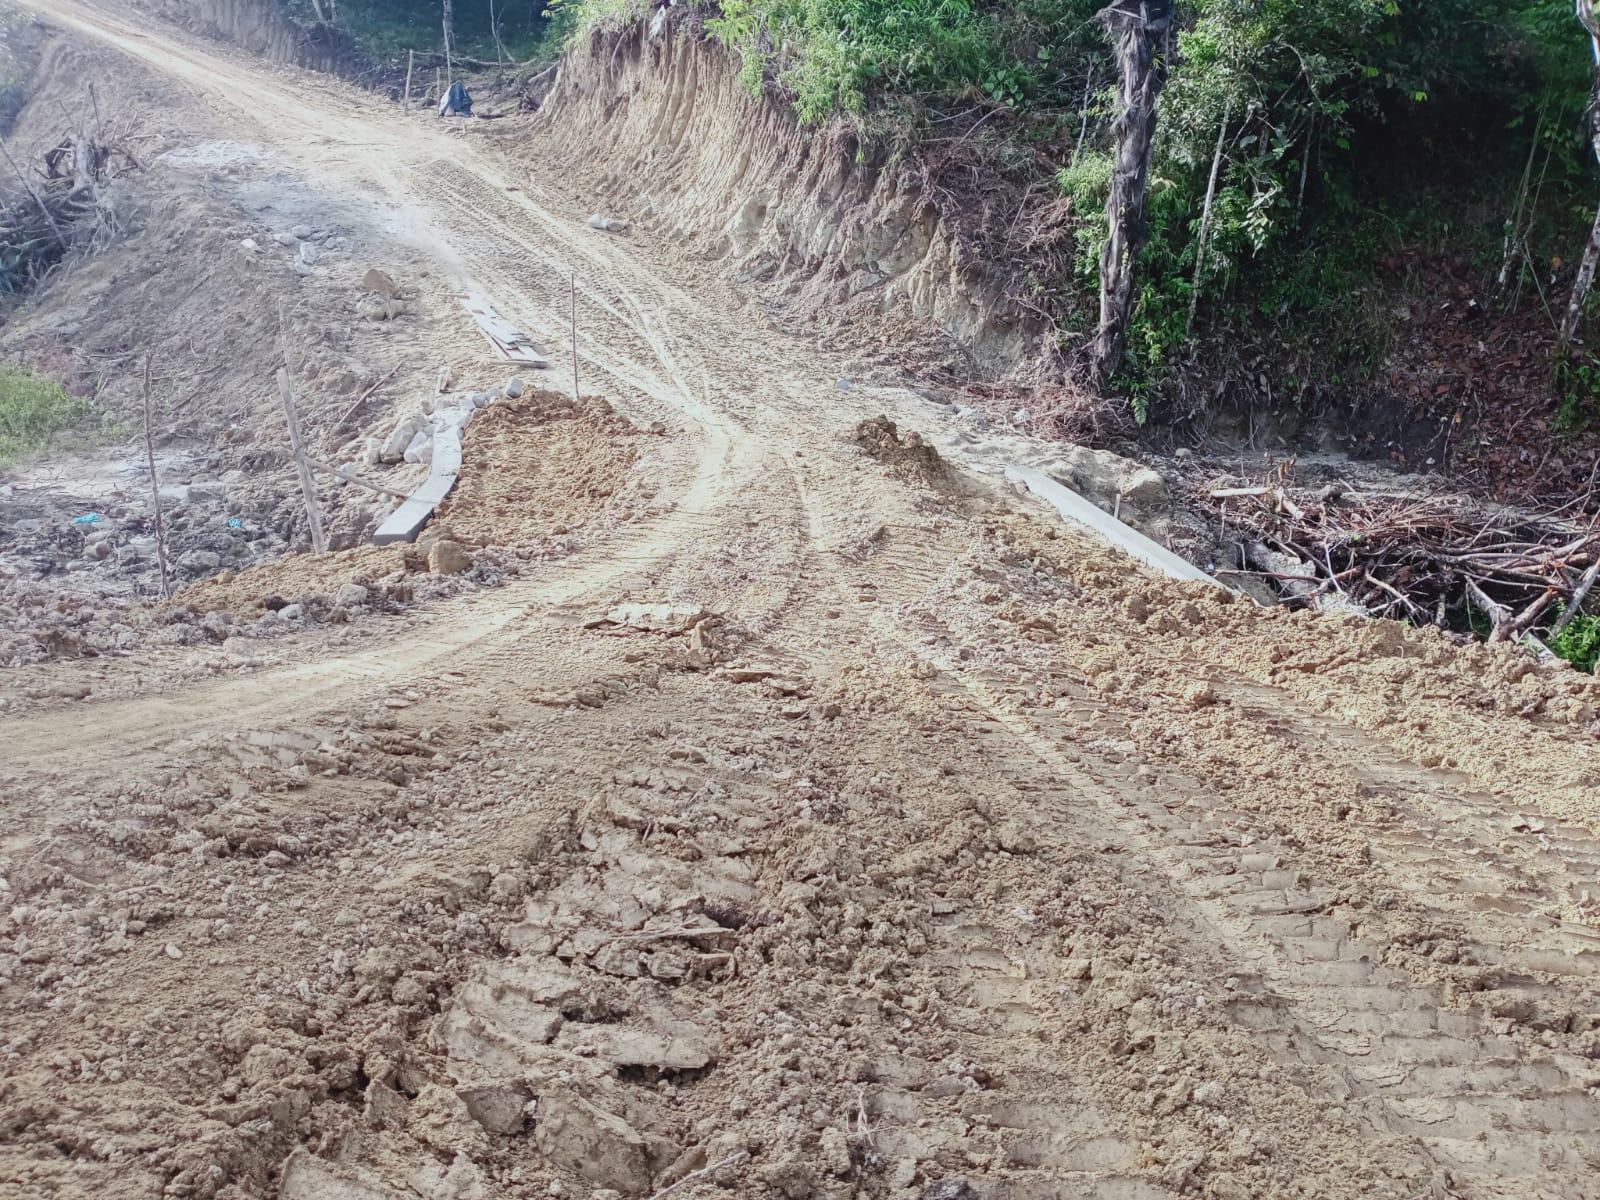 Baru di Bangun! Jalan Desa Program TMMD 112 Tertimbun Longsor Akibat Hujan Deras